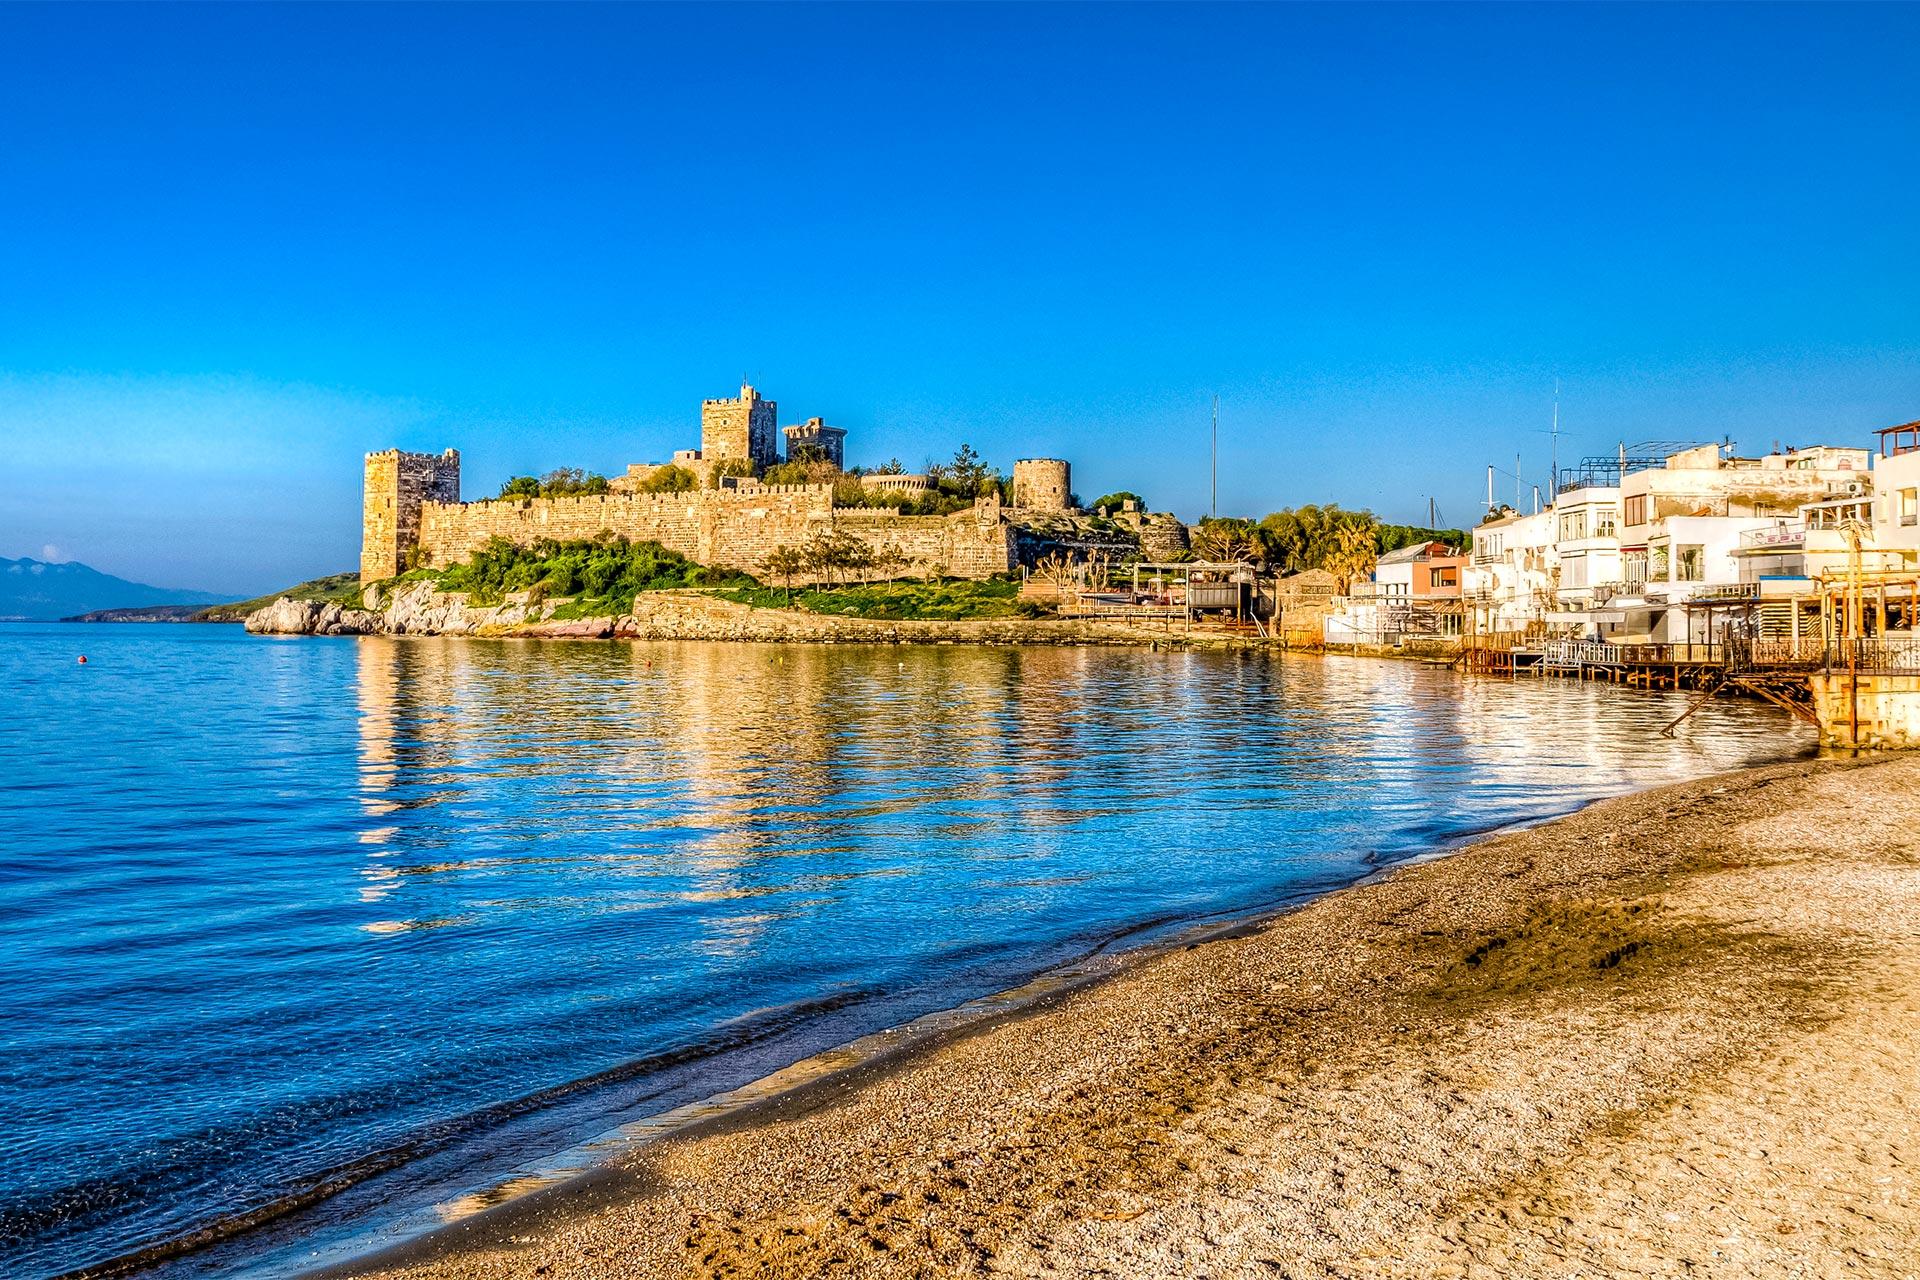 Sejur Charter plaja Bodrum, 8 zile